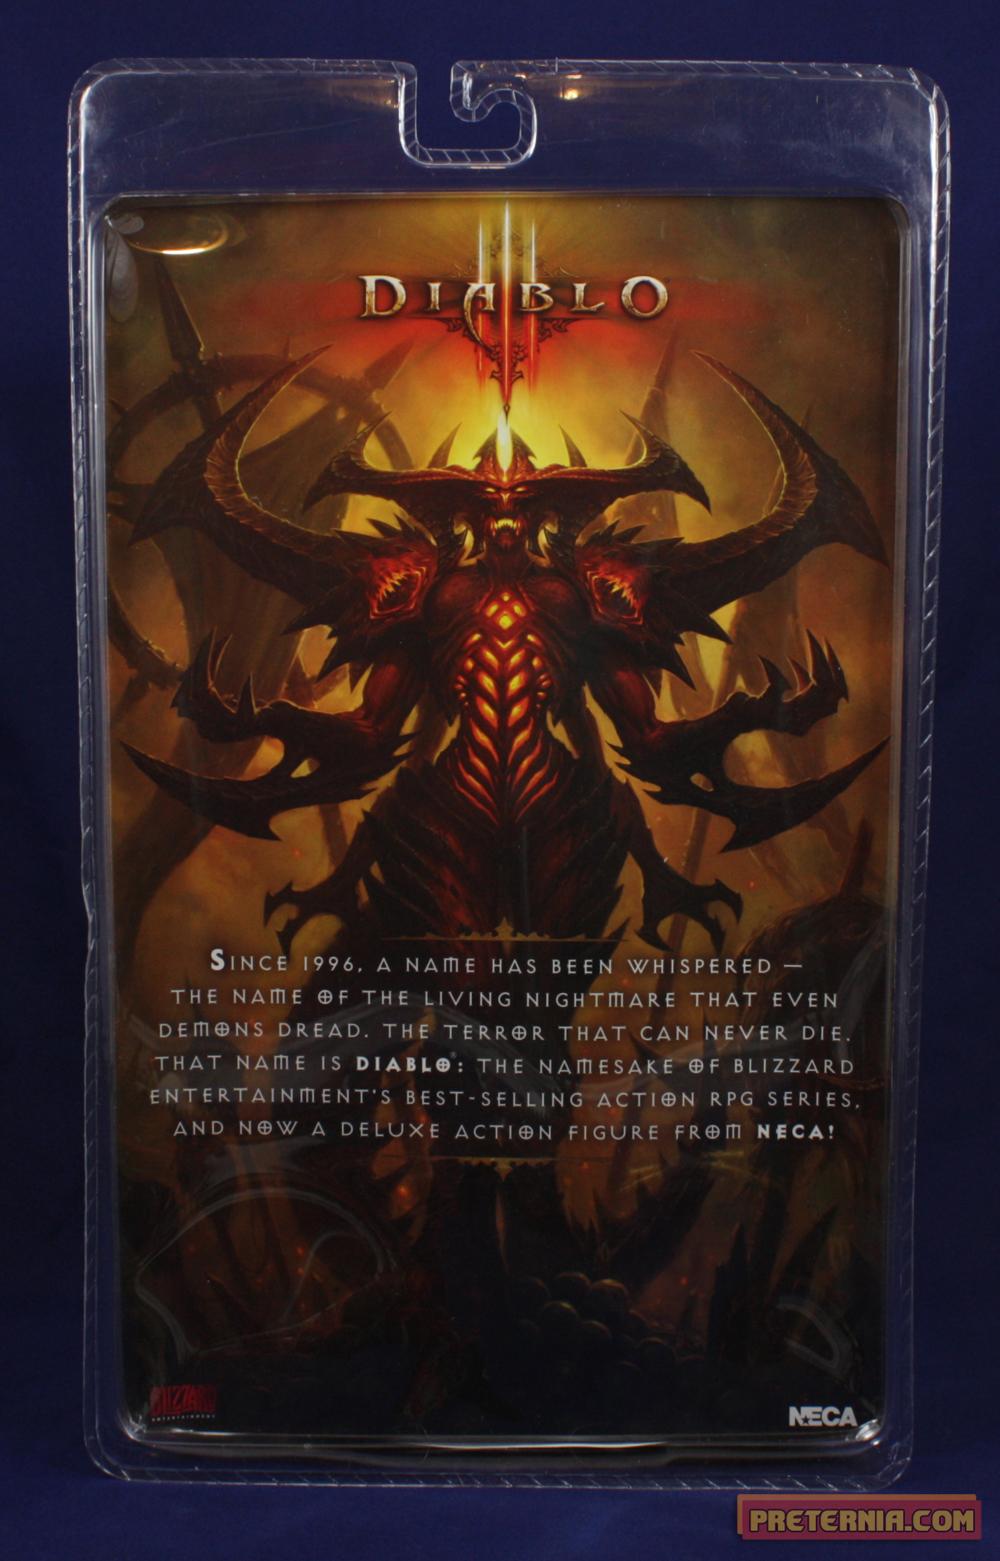 NECA Diablo (Diablo III) Review - Preternia